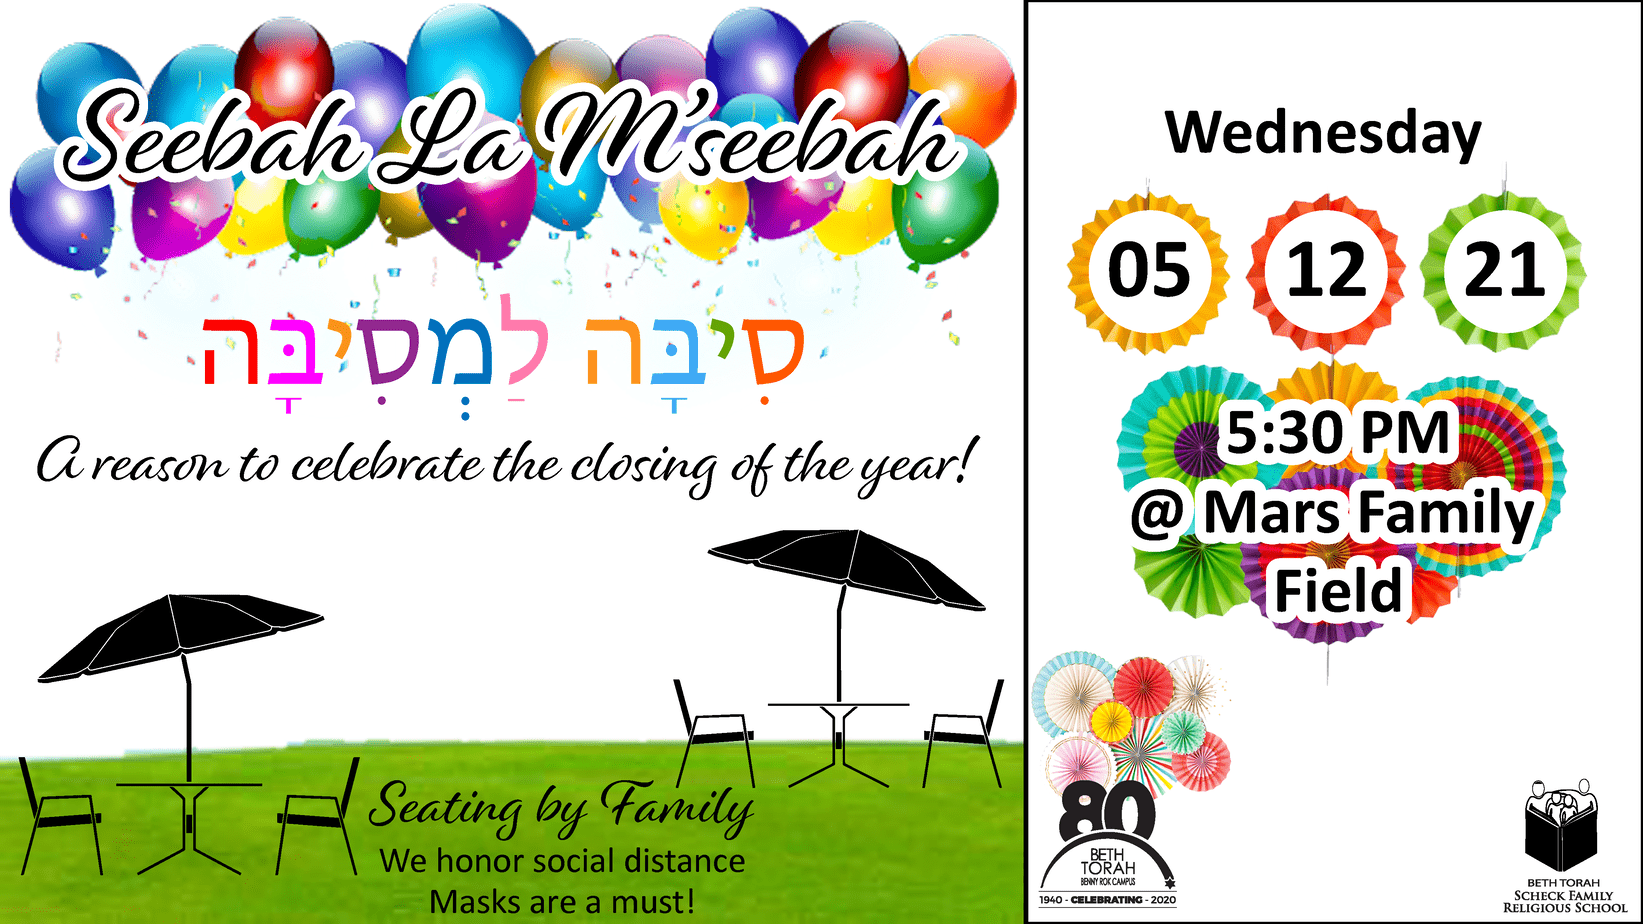 Seebah La M'seebah flyer for media